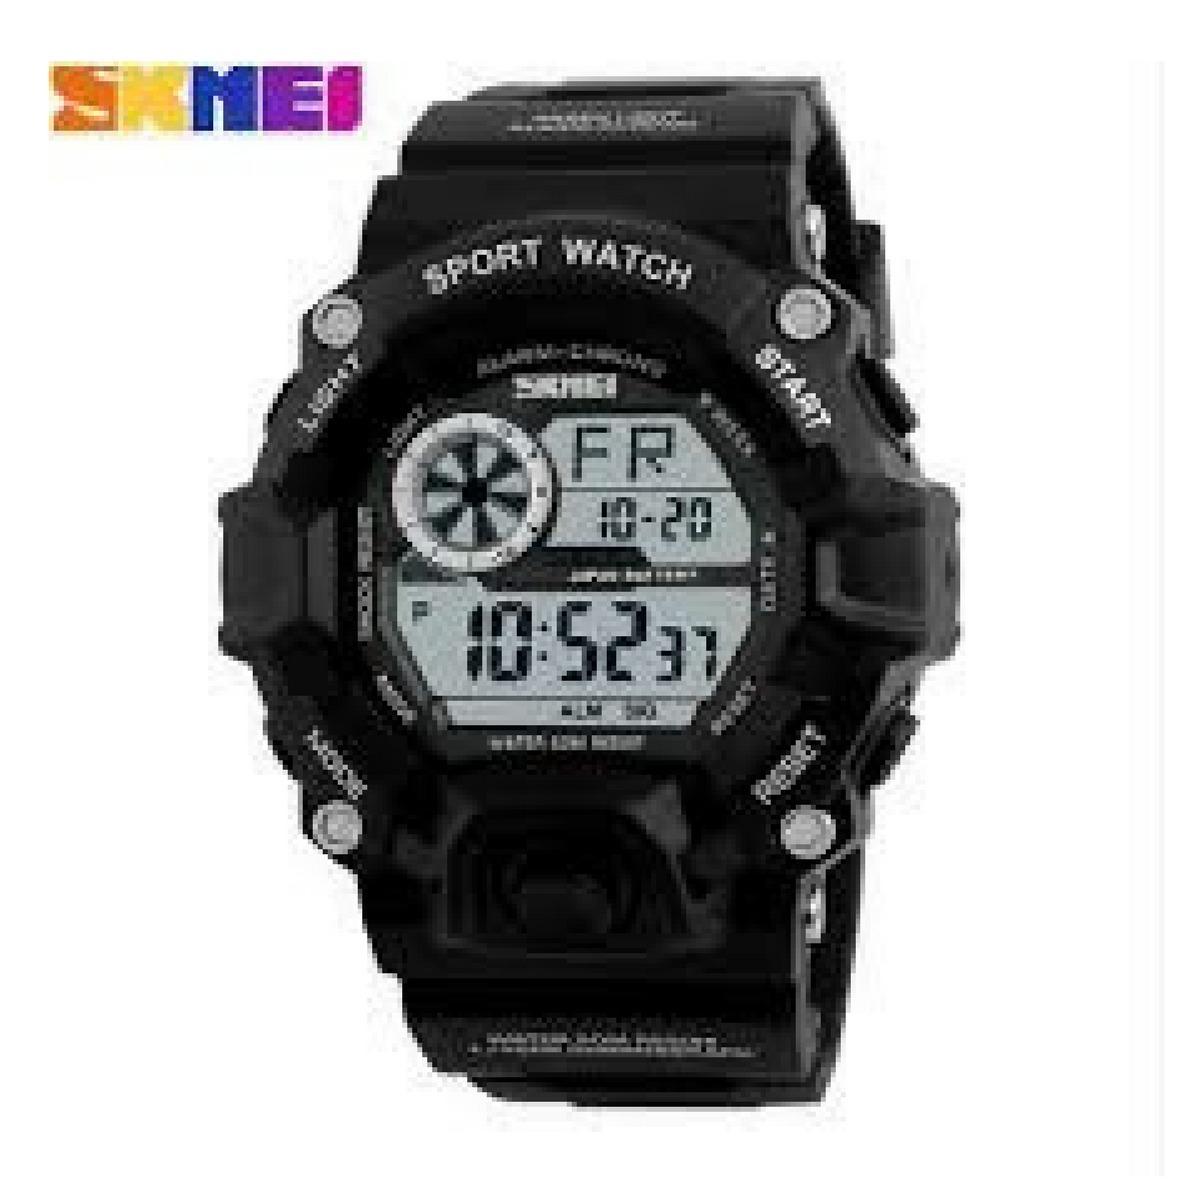 b7fedd1e3b2 relógio masculino skmei esportivo prova d agua exercito. Carregando zoom.